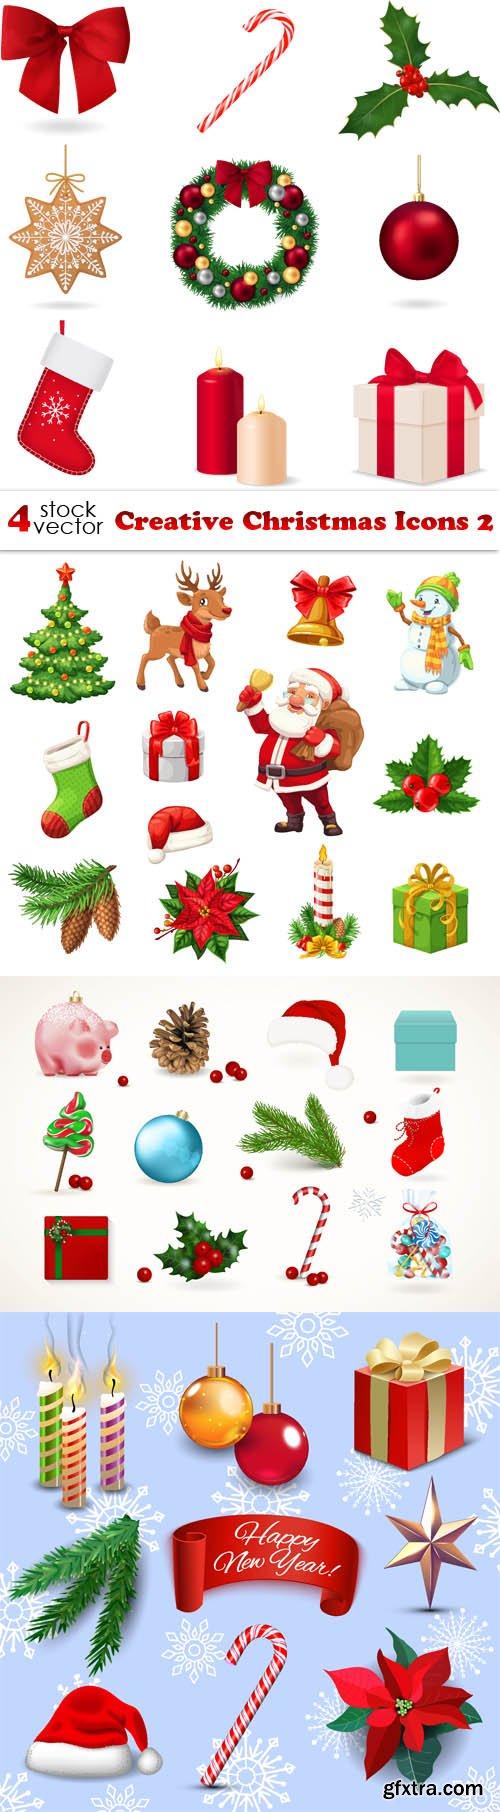 Vectors - Creative Christmas Icons 2